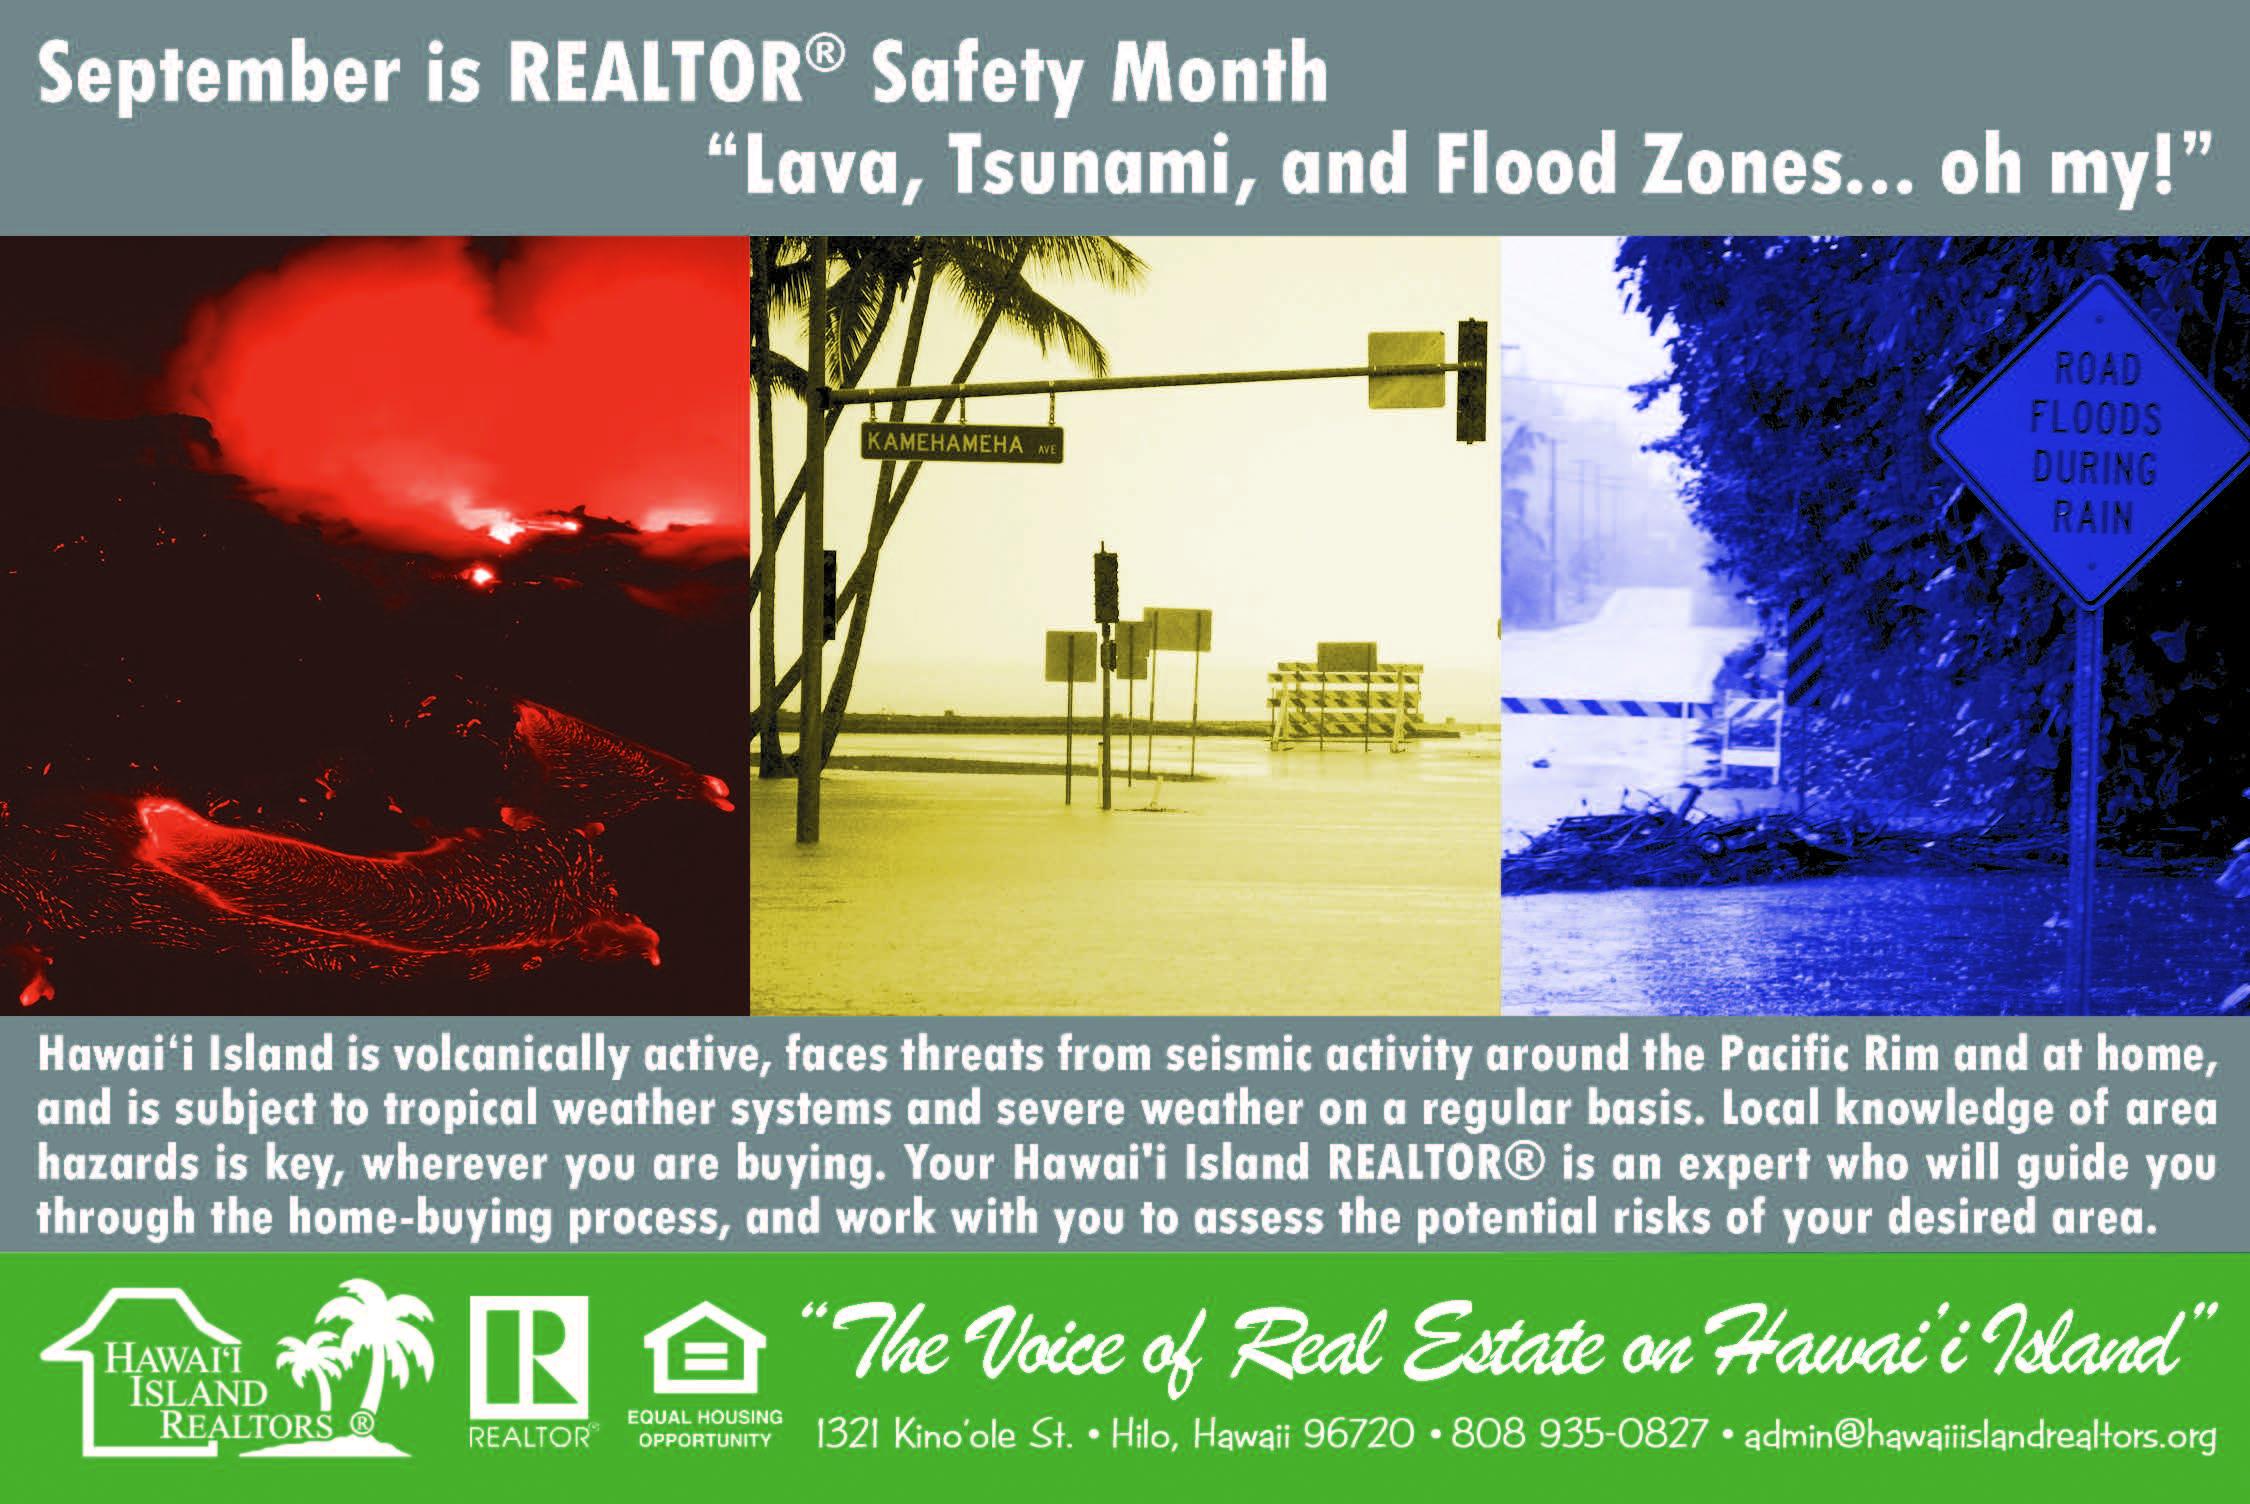 September is REALTOR® Safety Month